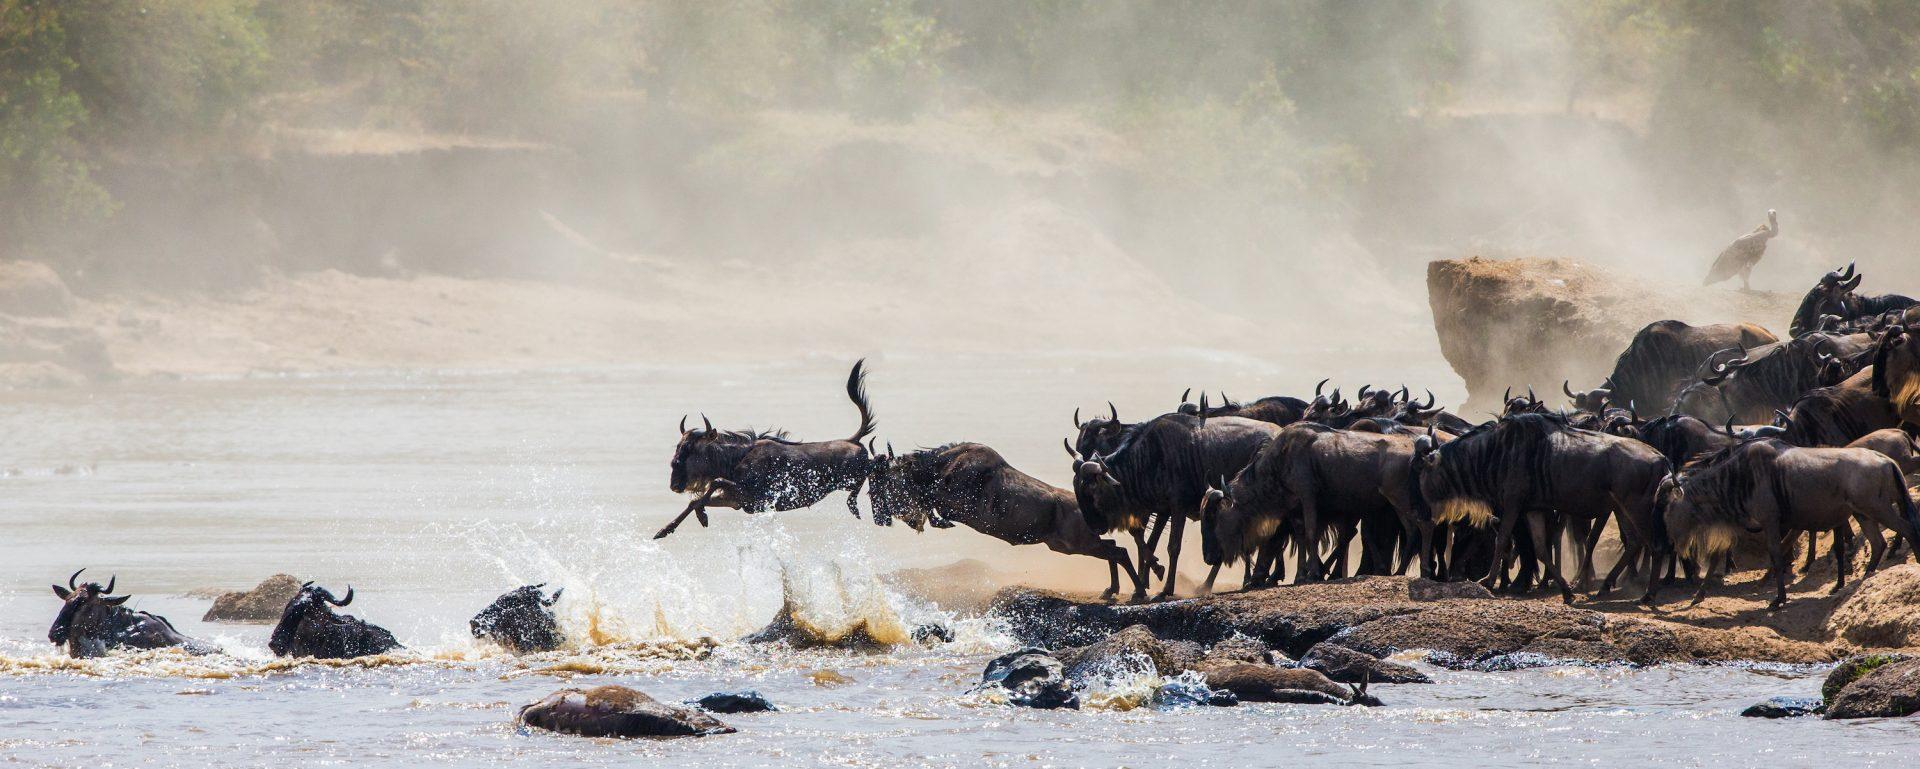 Tanzania Wildebeest Migration - Serengeti